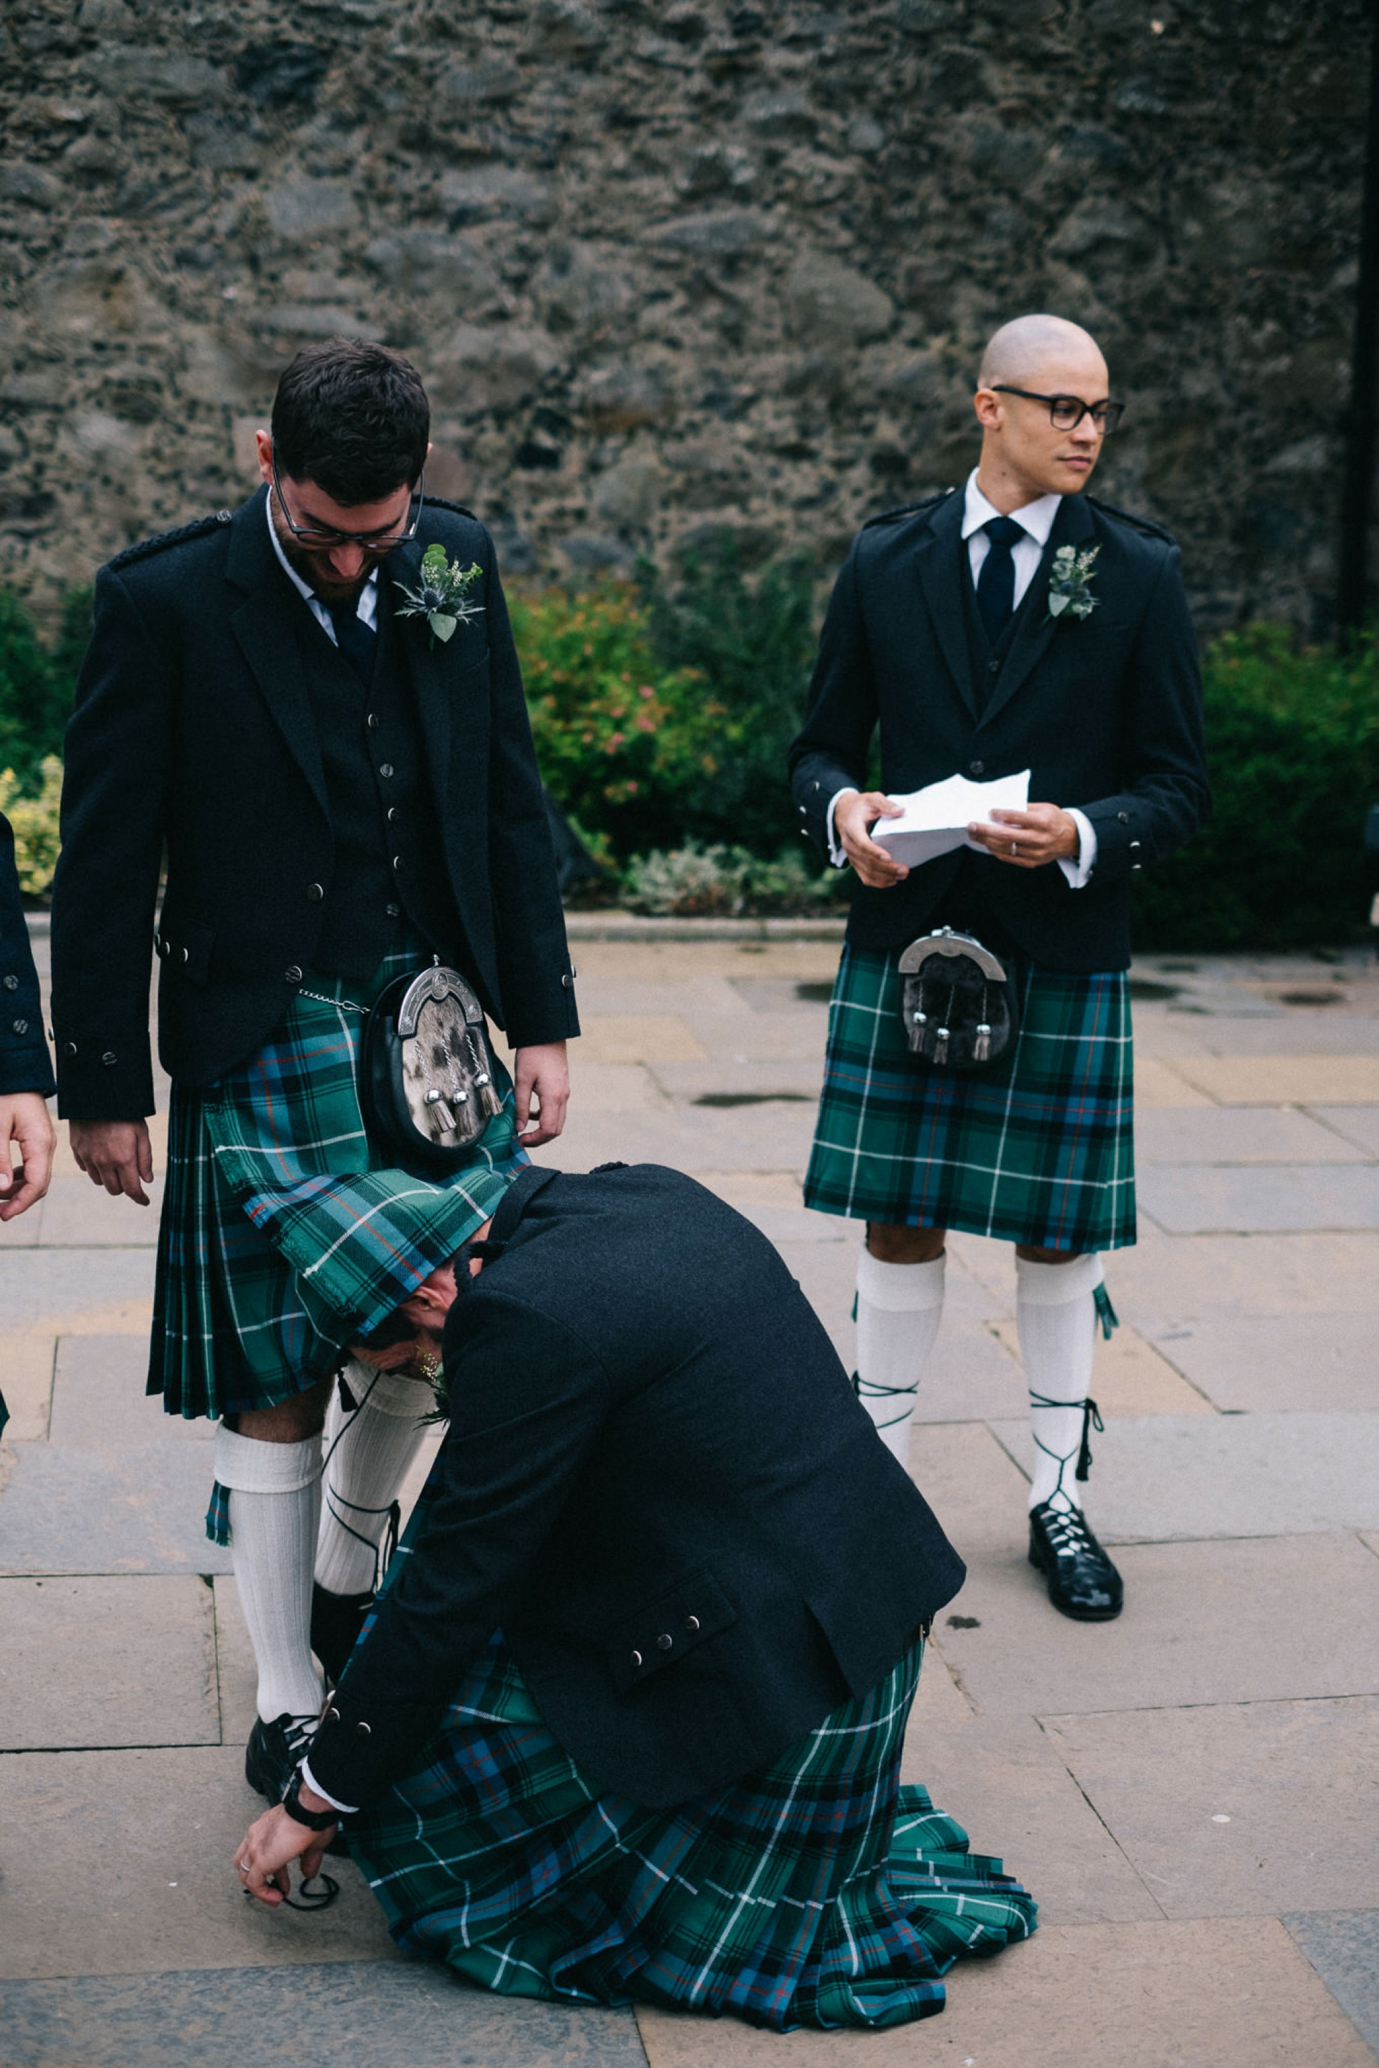 20170826_euan robertson weddings_026_WEB.jpg